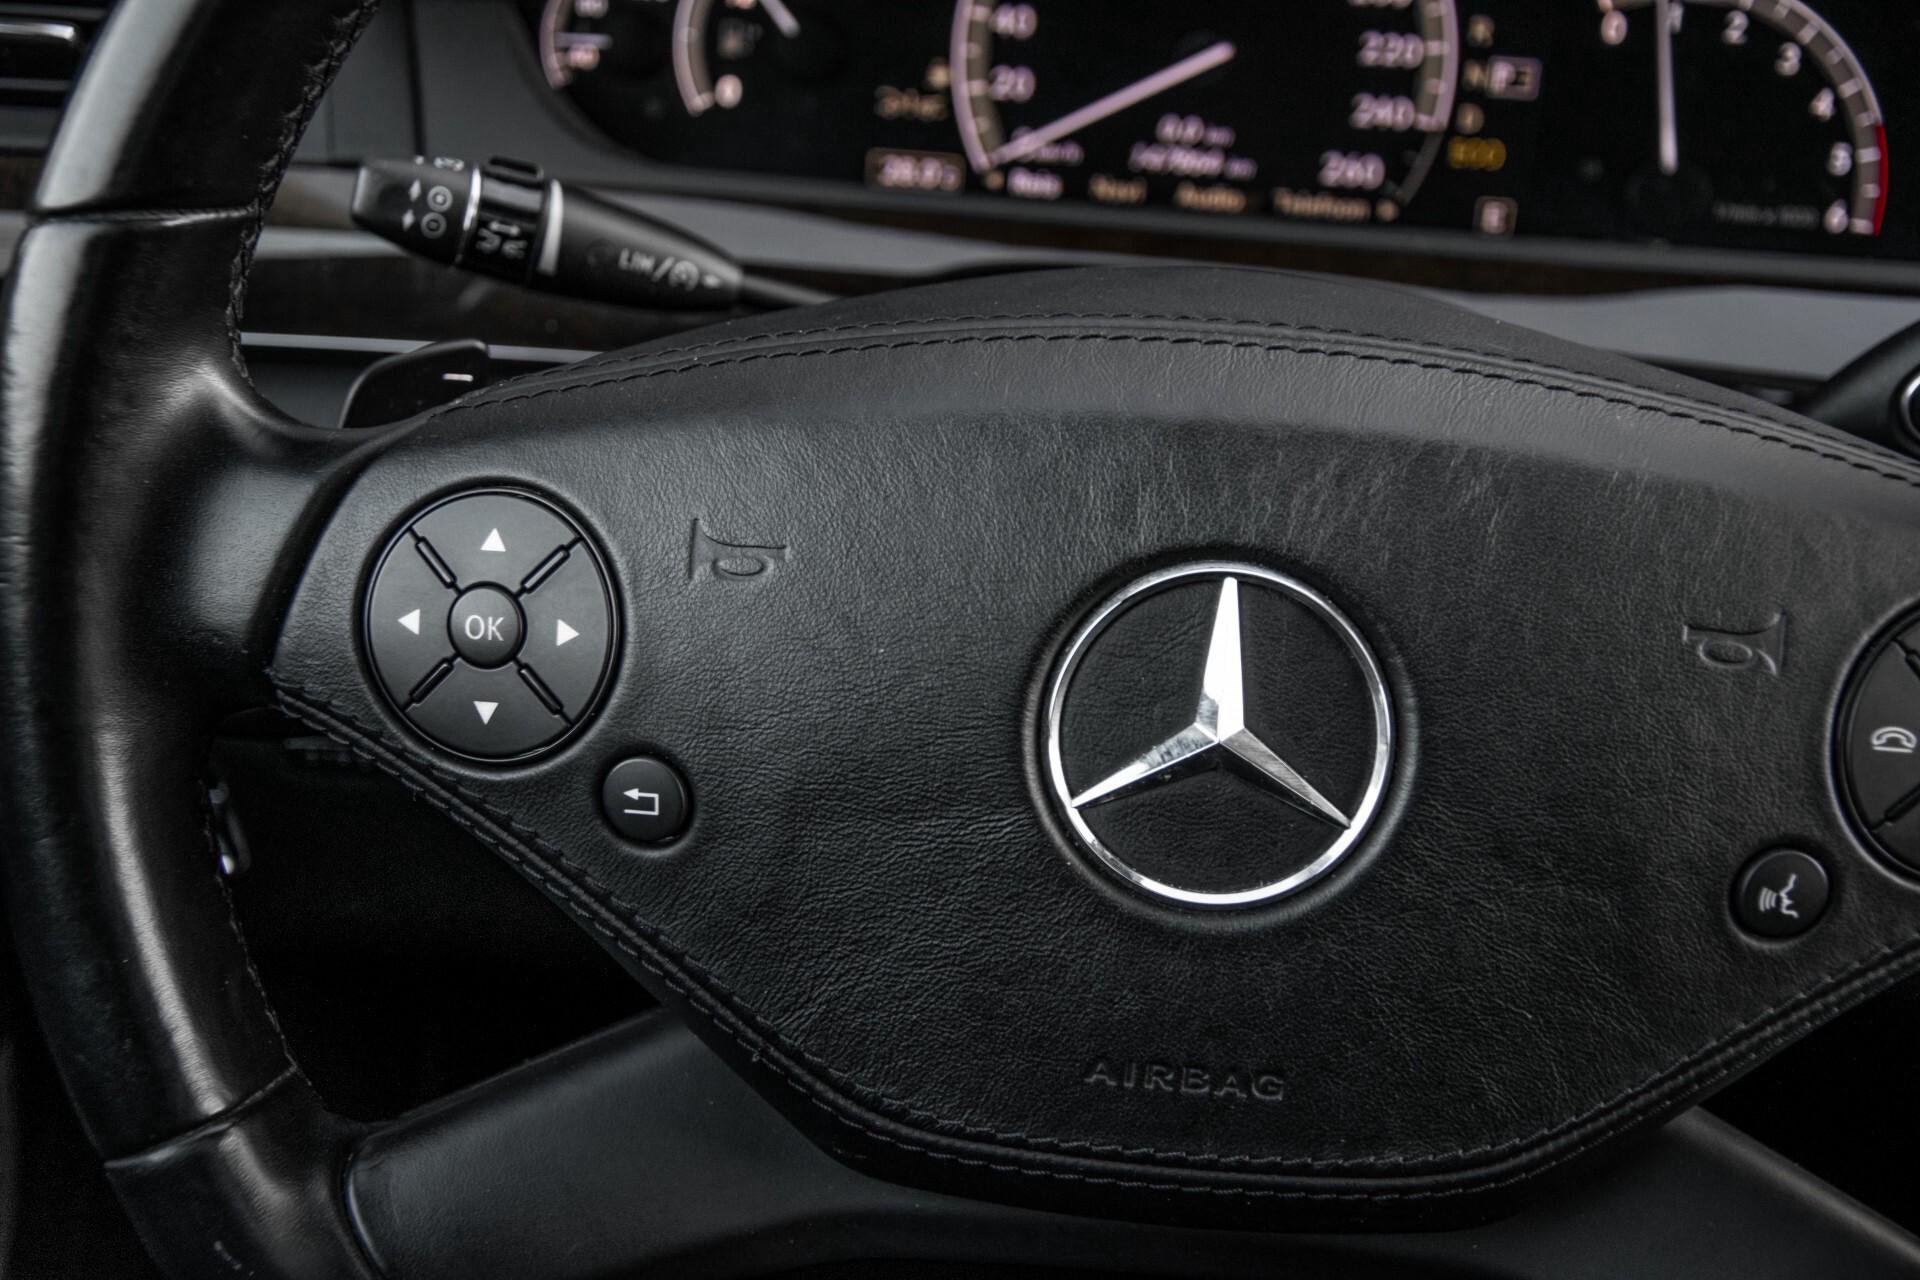 Mercedes-Benz S-Klasse 350 Bluetec Keyless/Distronic/Nightvision/Schuifdak/Harman-Kardon Aut7 Foto 10